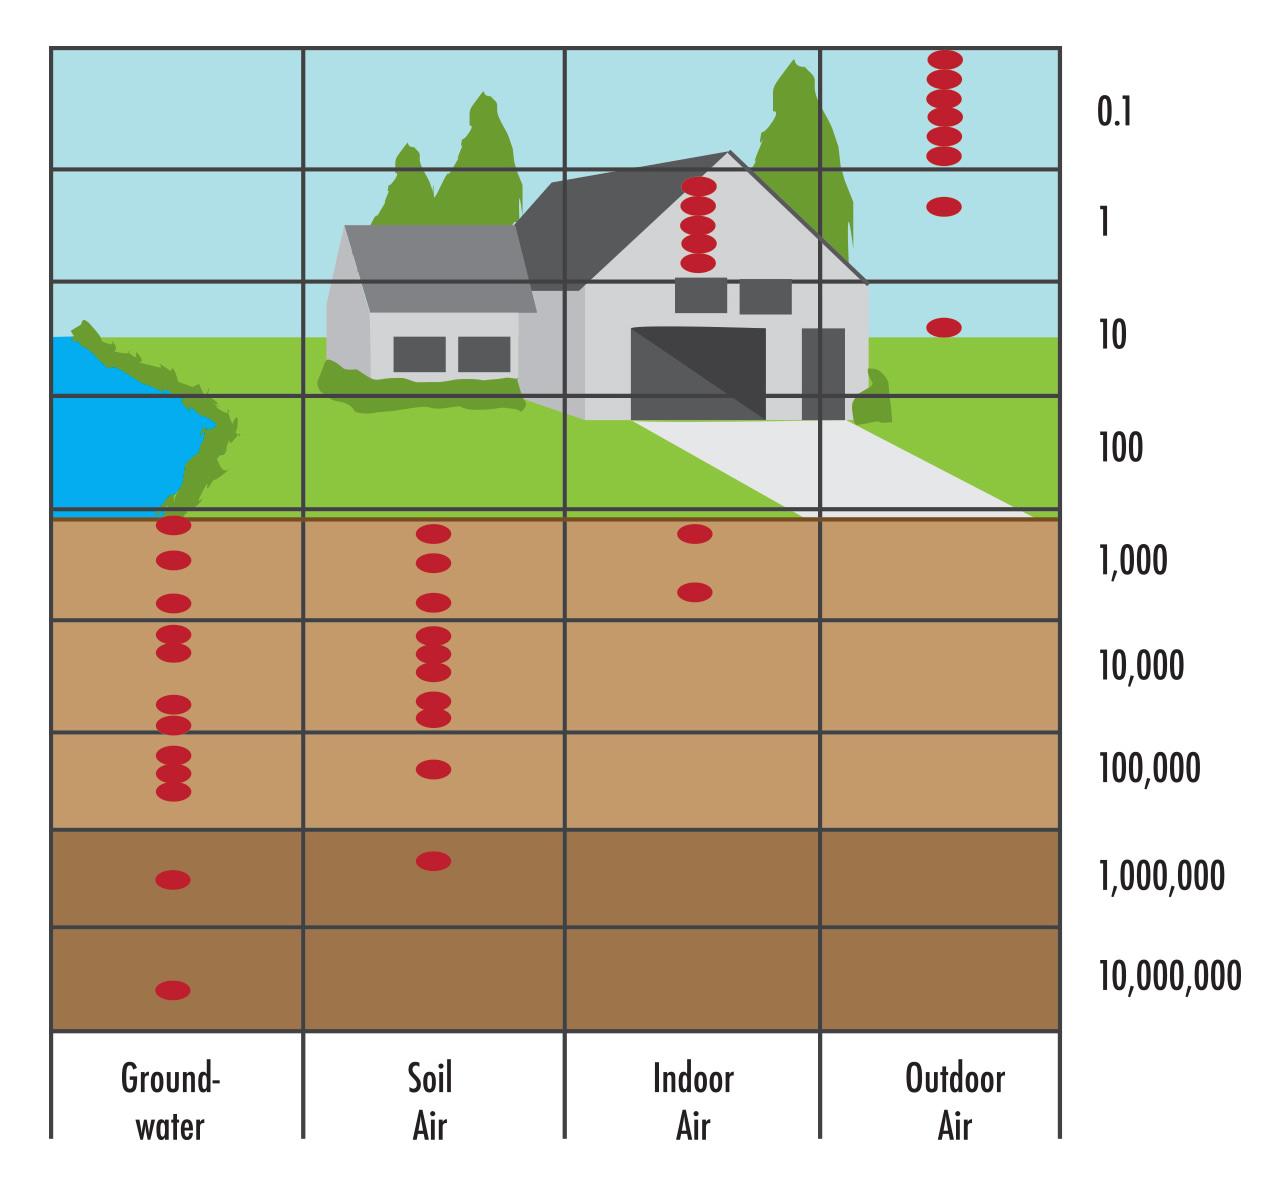 Radon in picocuries per liter.